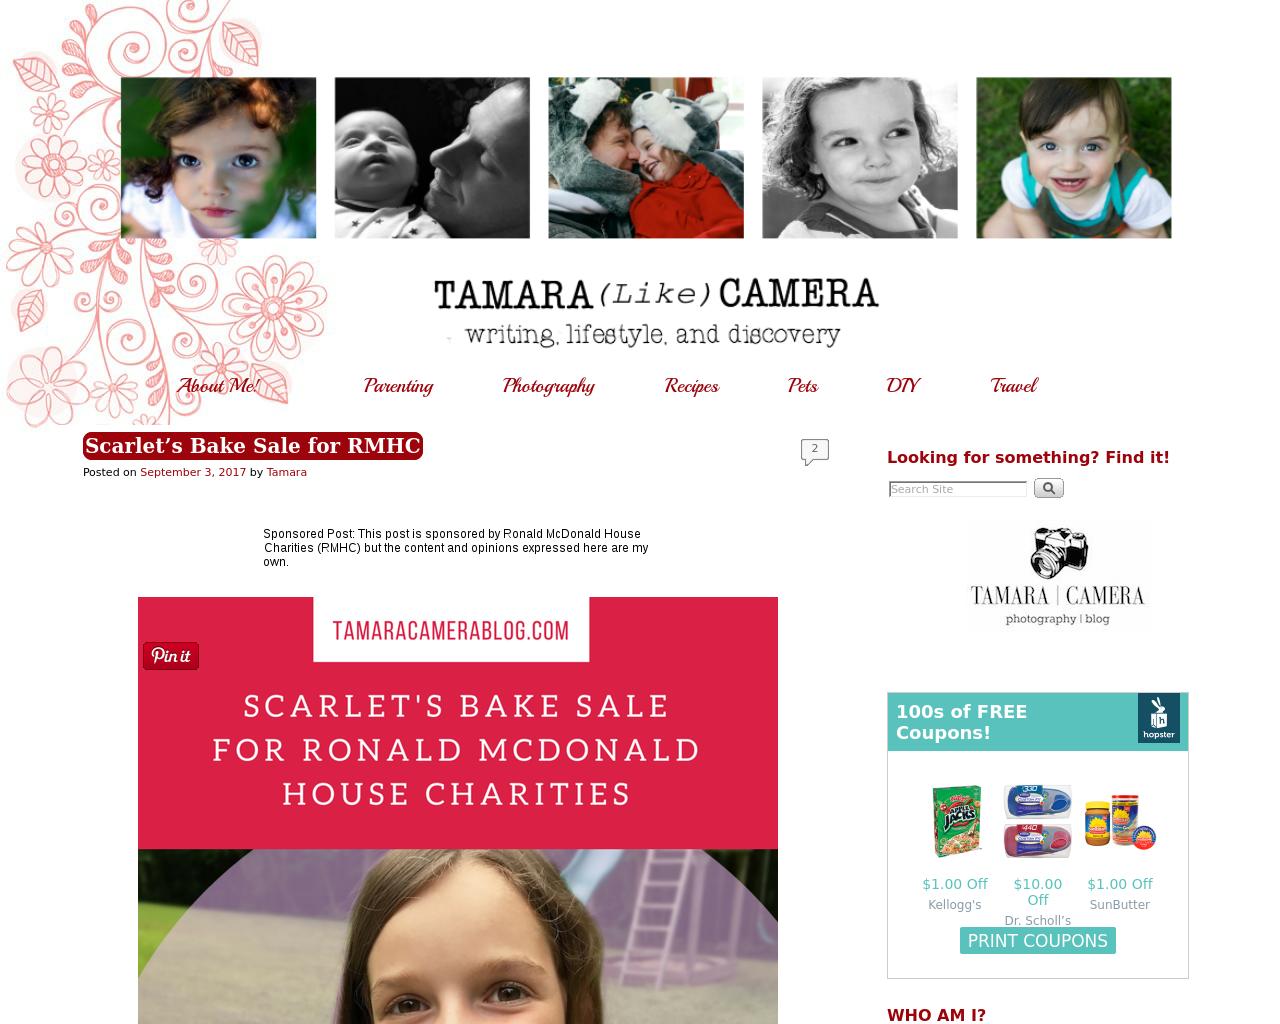 Tamara-Camera-Blog-Advertising-Reviews-Pricing